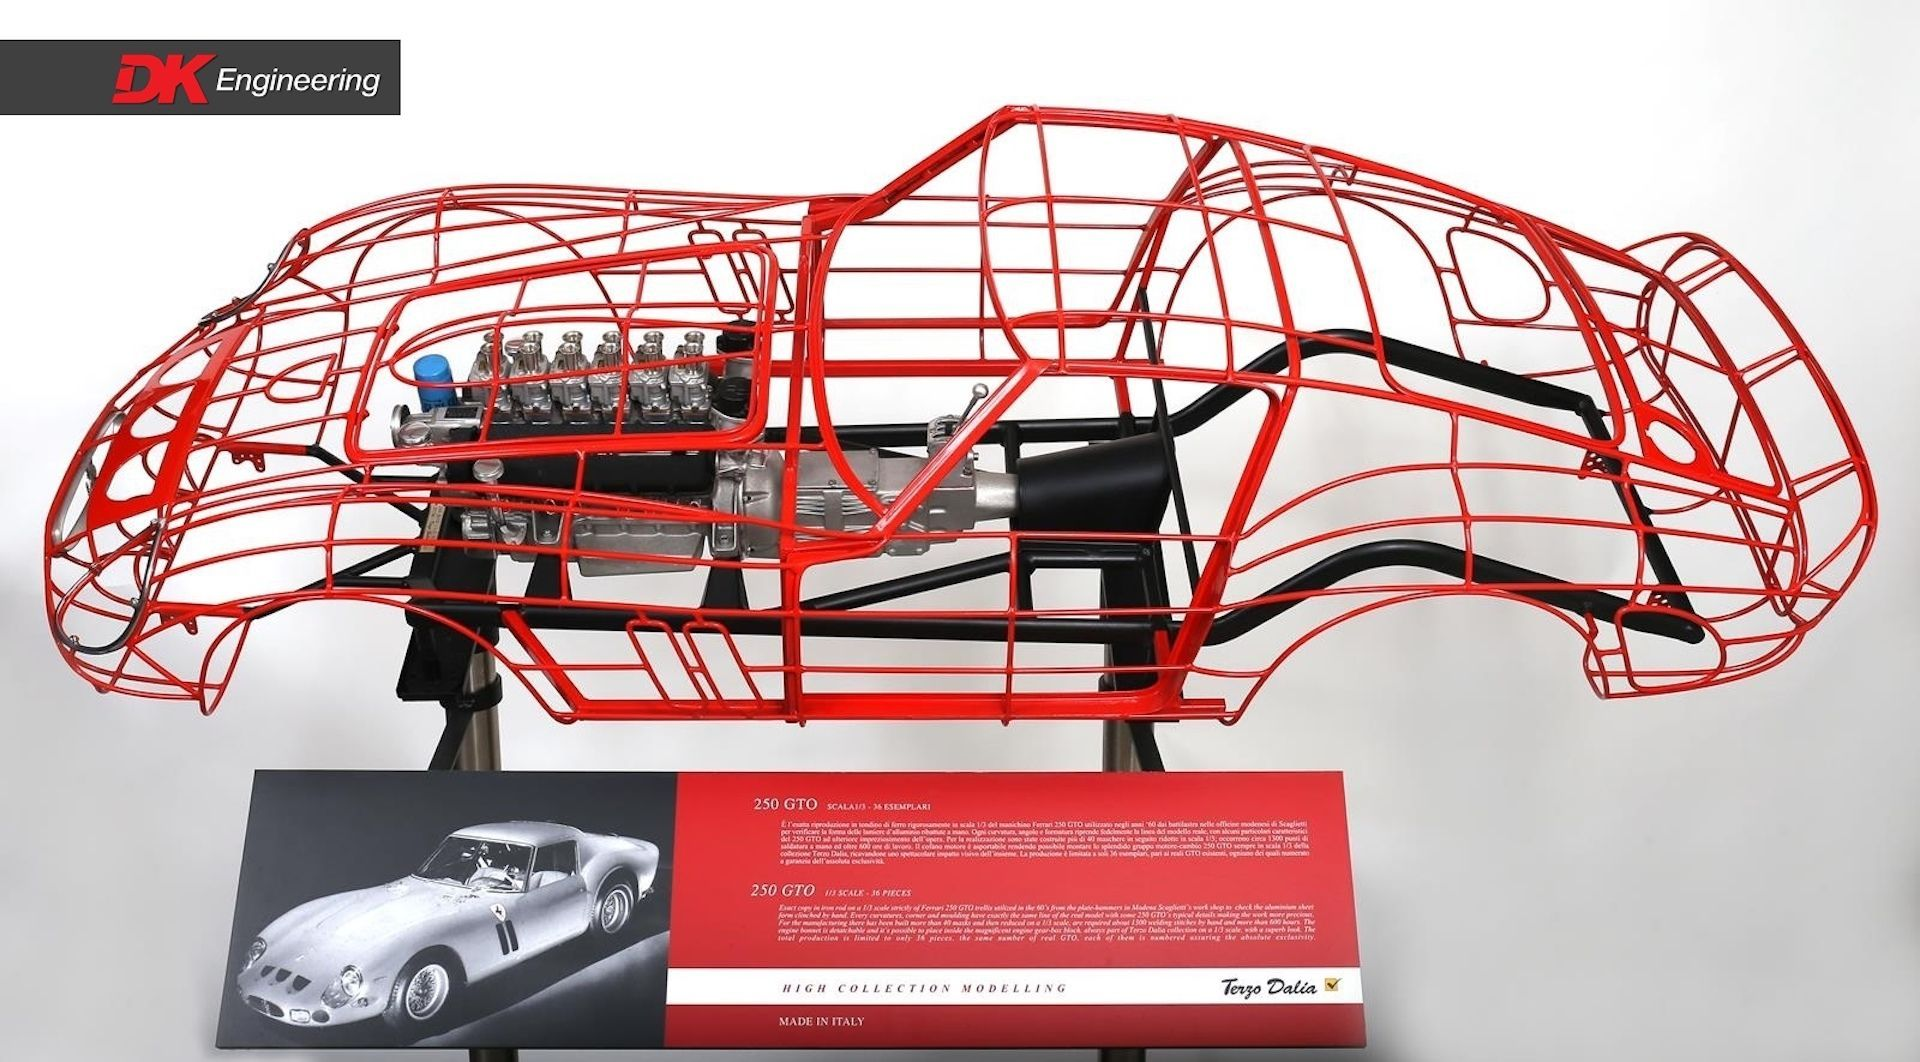 Terzo-Dalia-Ferrari-engines-4